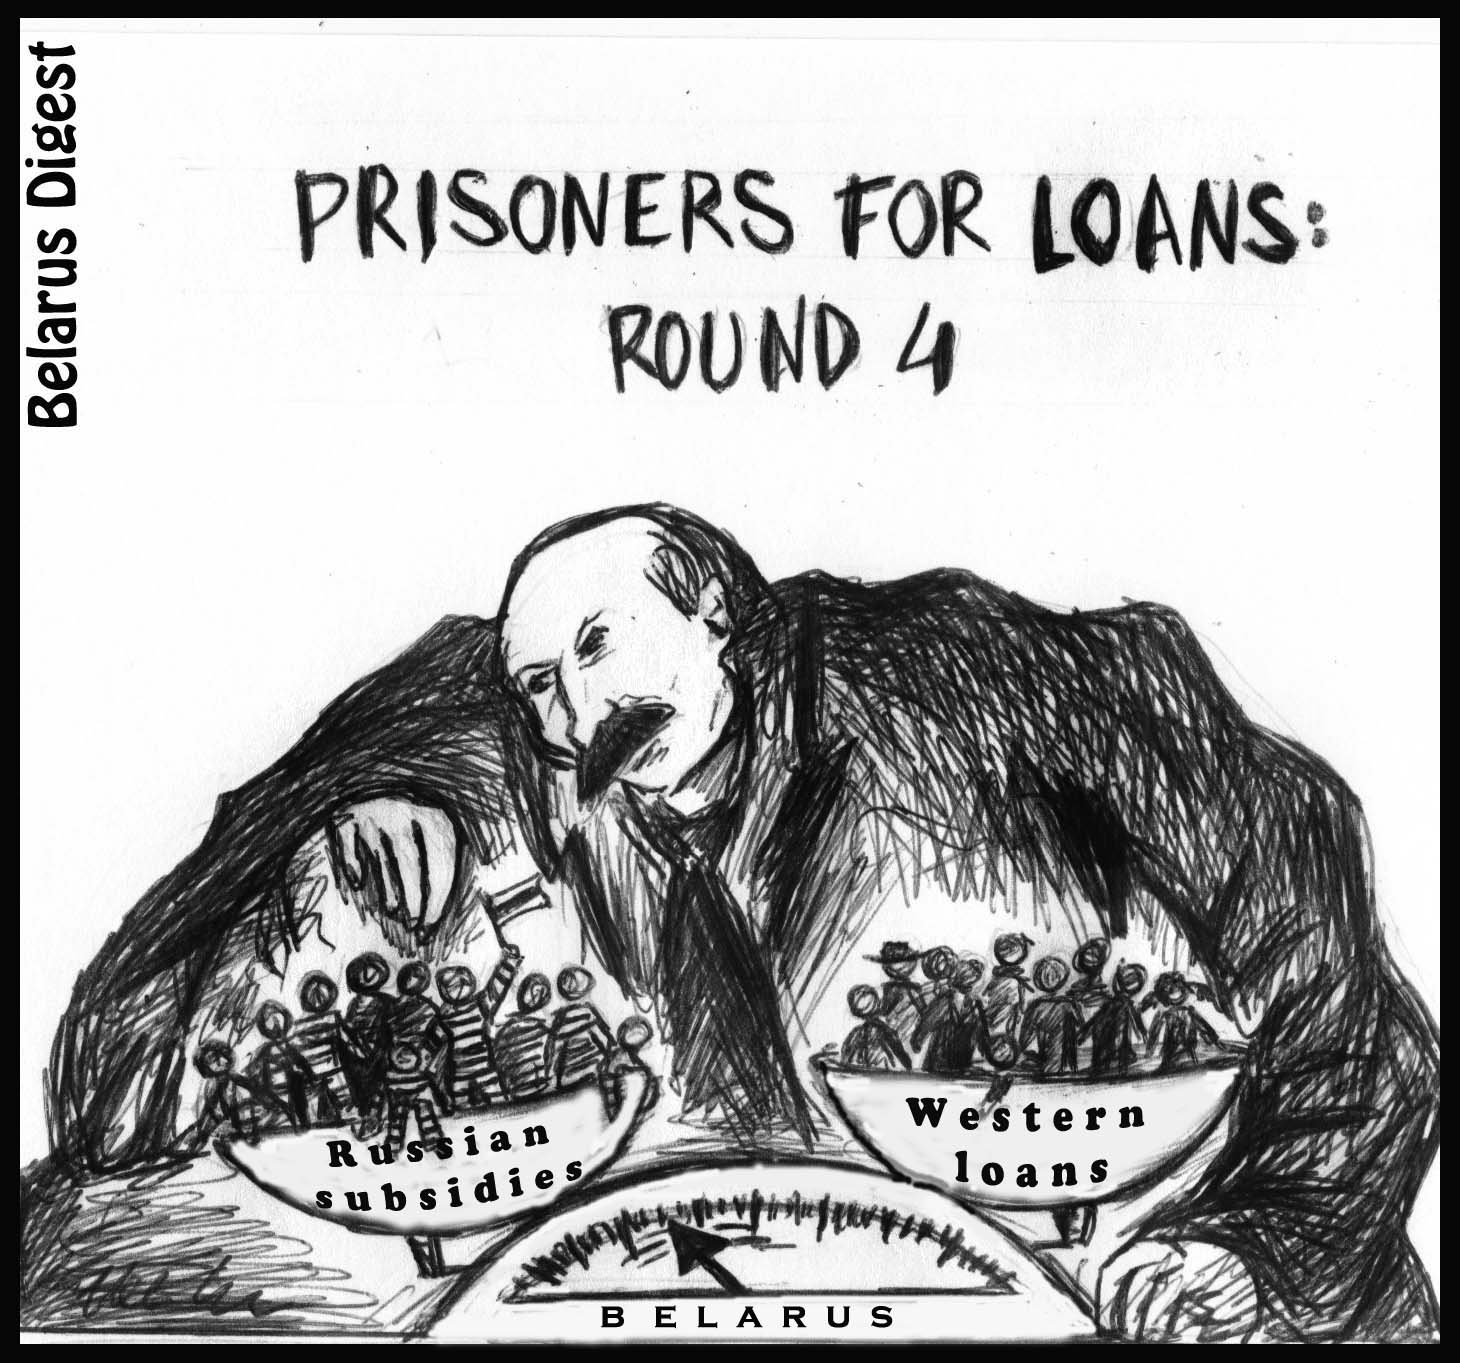 prisonersapril2012-b.jpg